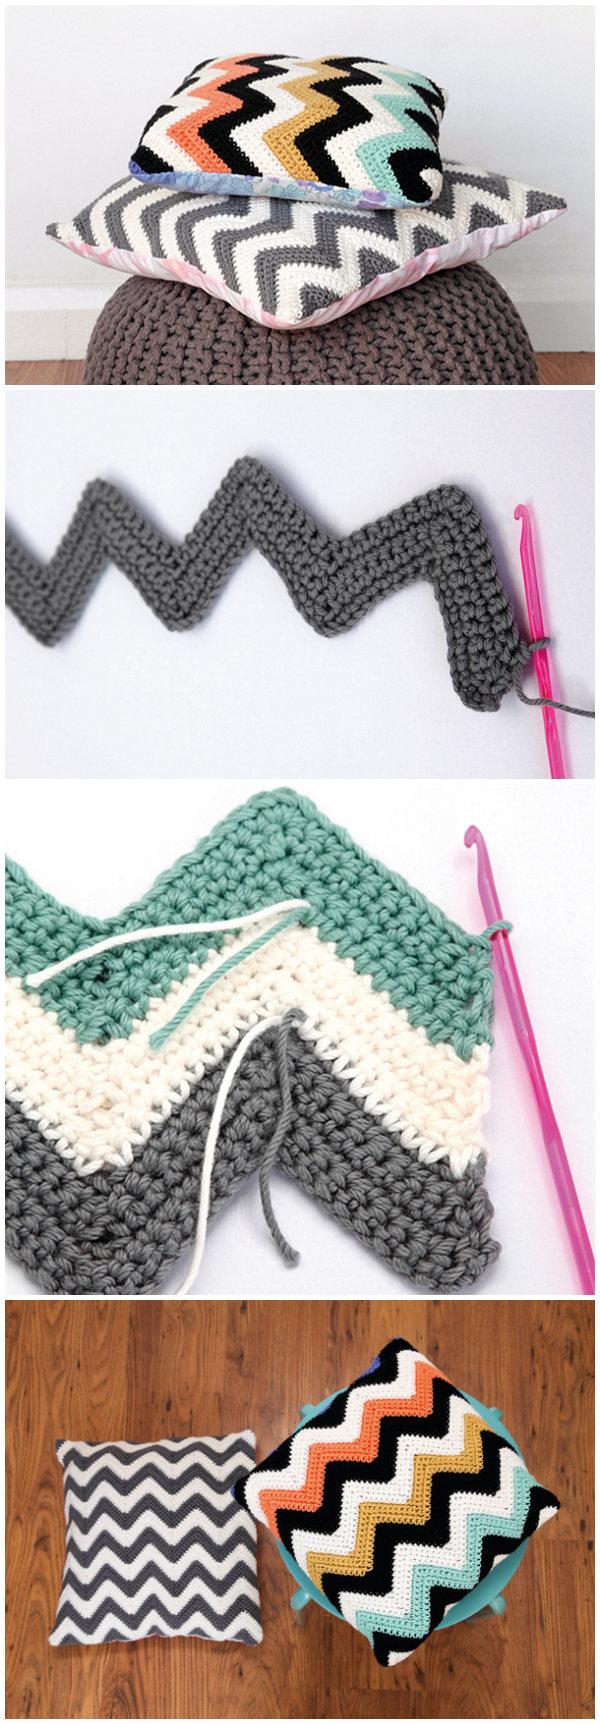 How To Crochet Chevron Cushions